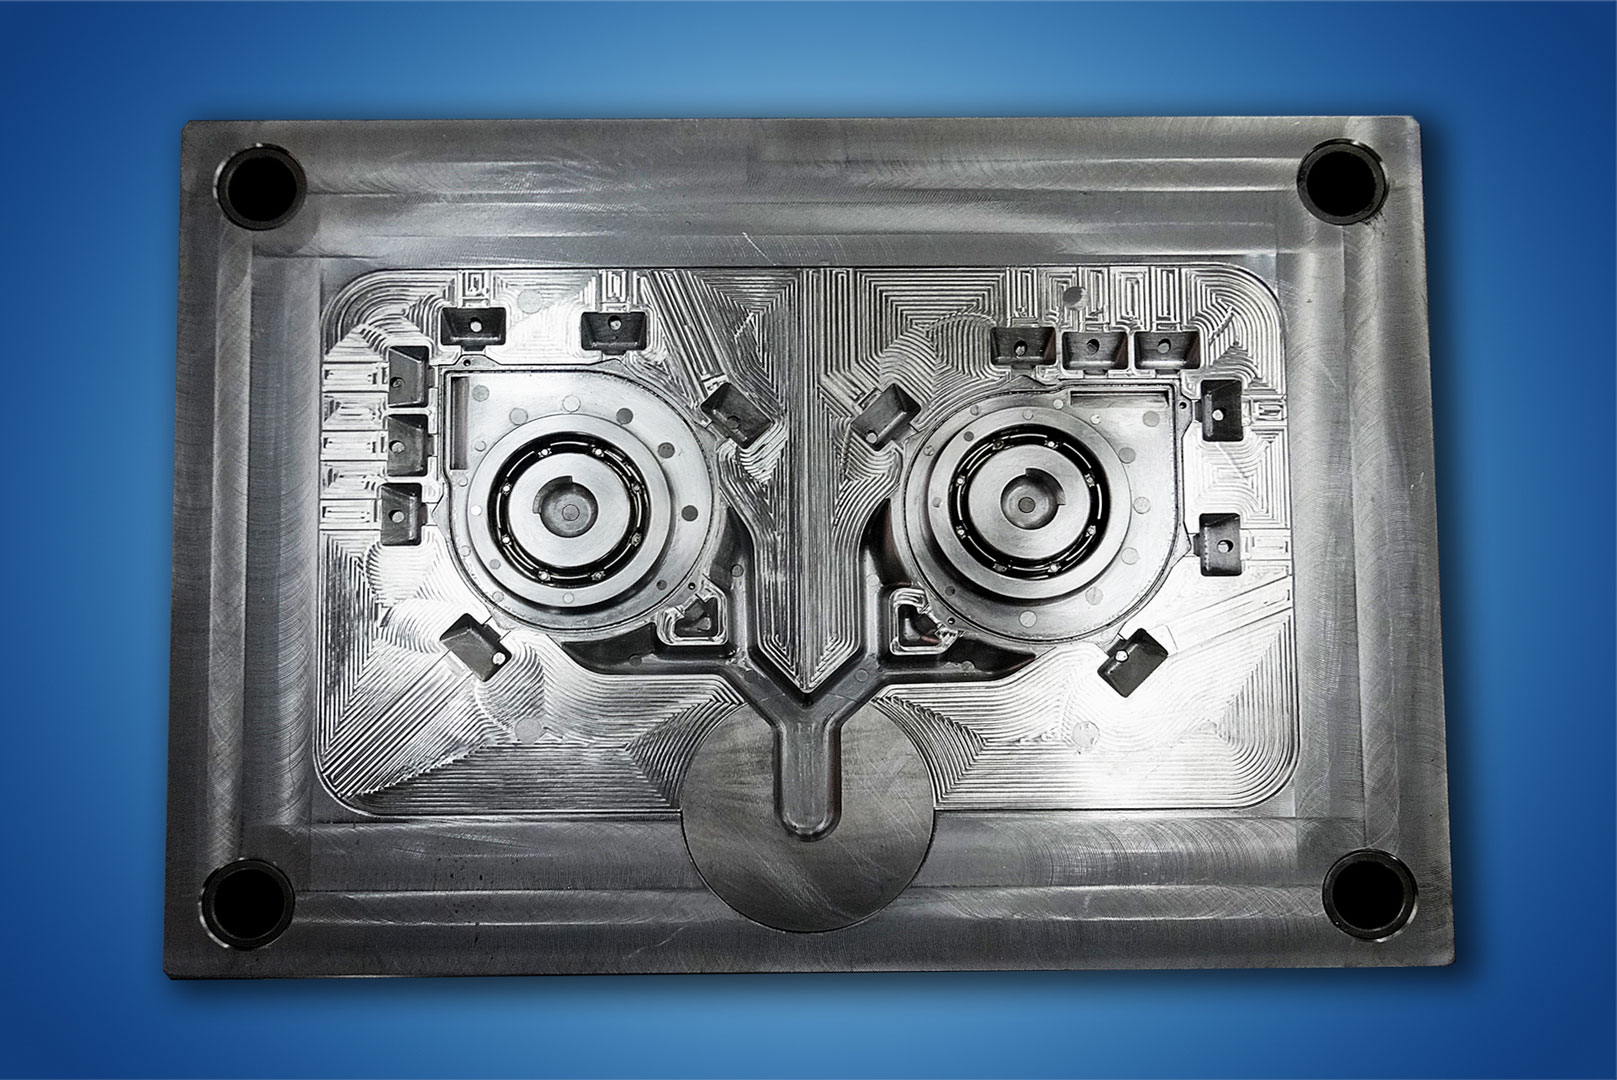 Ero-Projekt-d.o.o.-Toolshop-Werkzeugbau-4-Orodja-za-tlacno-litje-_-slika-3